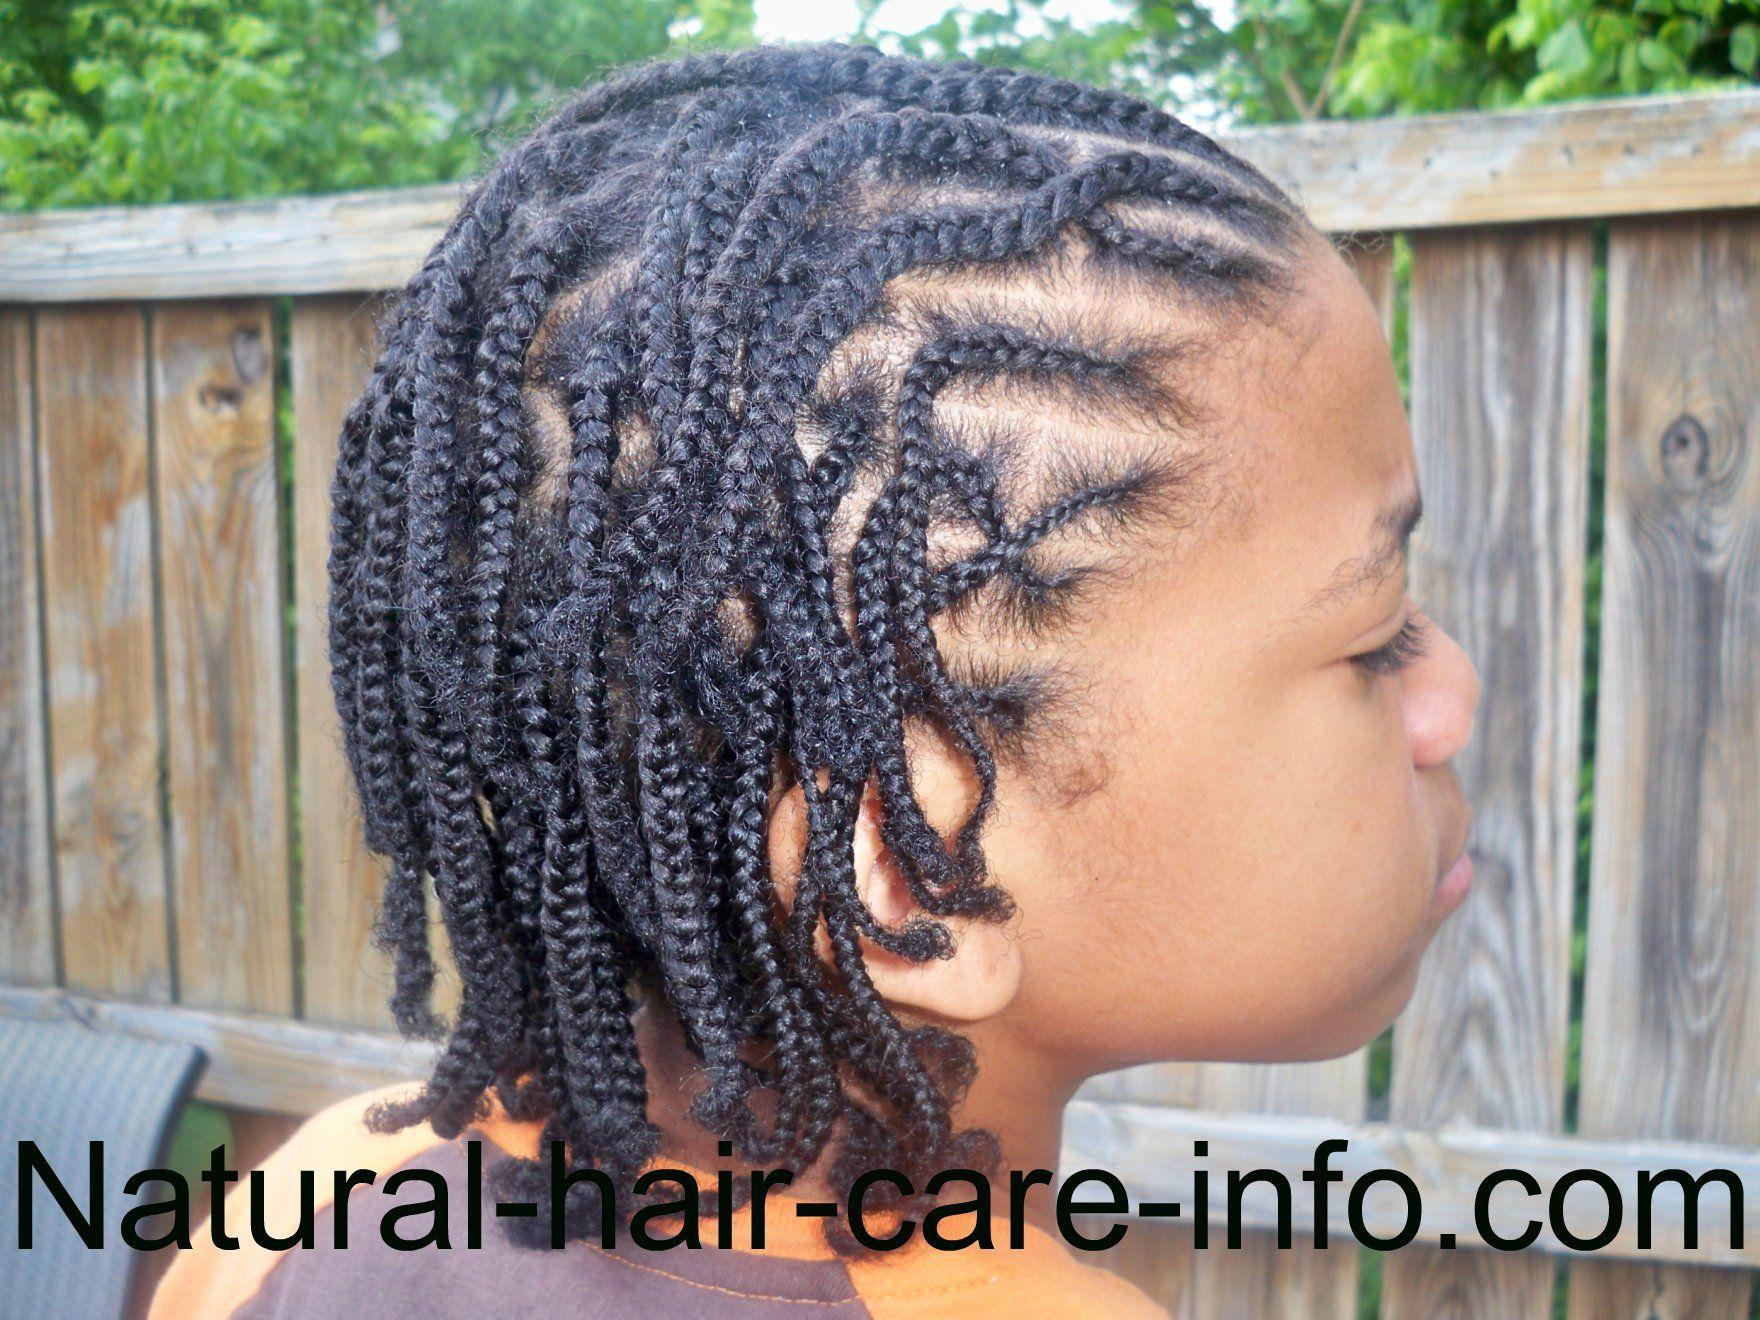 Superb 1000 Ideas About Braids For Boys On Pinterest Boy Braids Braid Short Hairstyles For Black Women Fulllsitofus